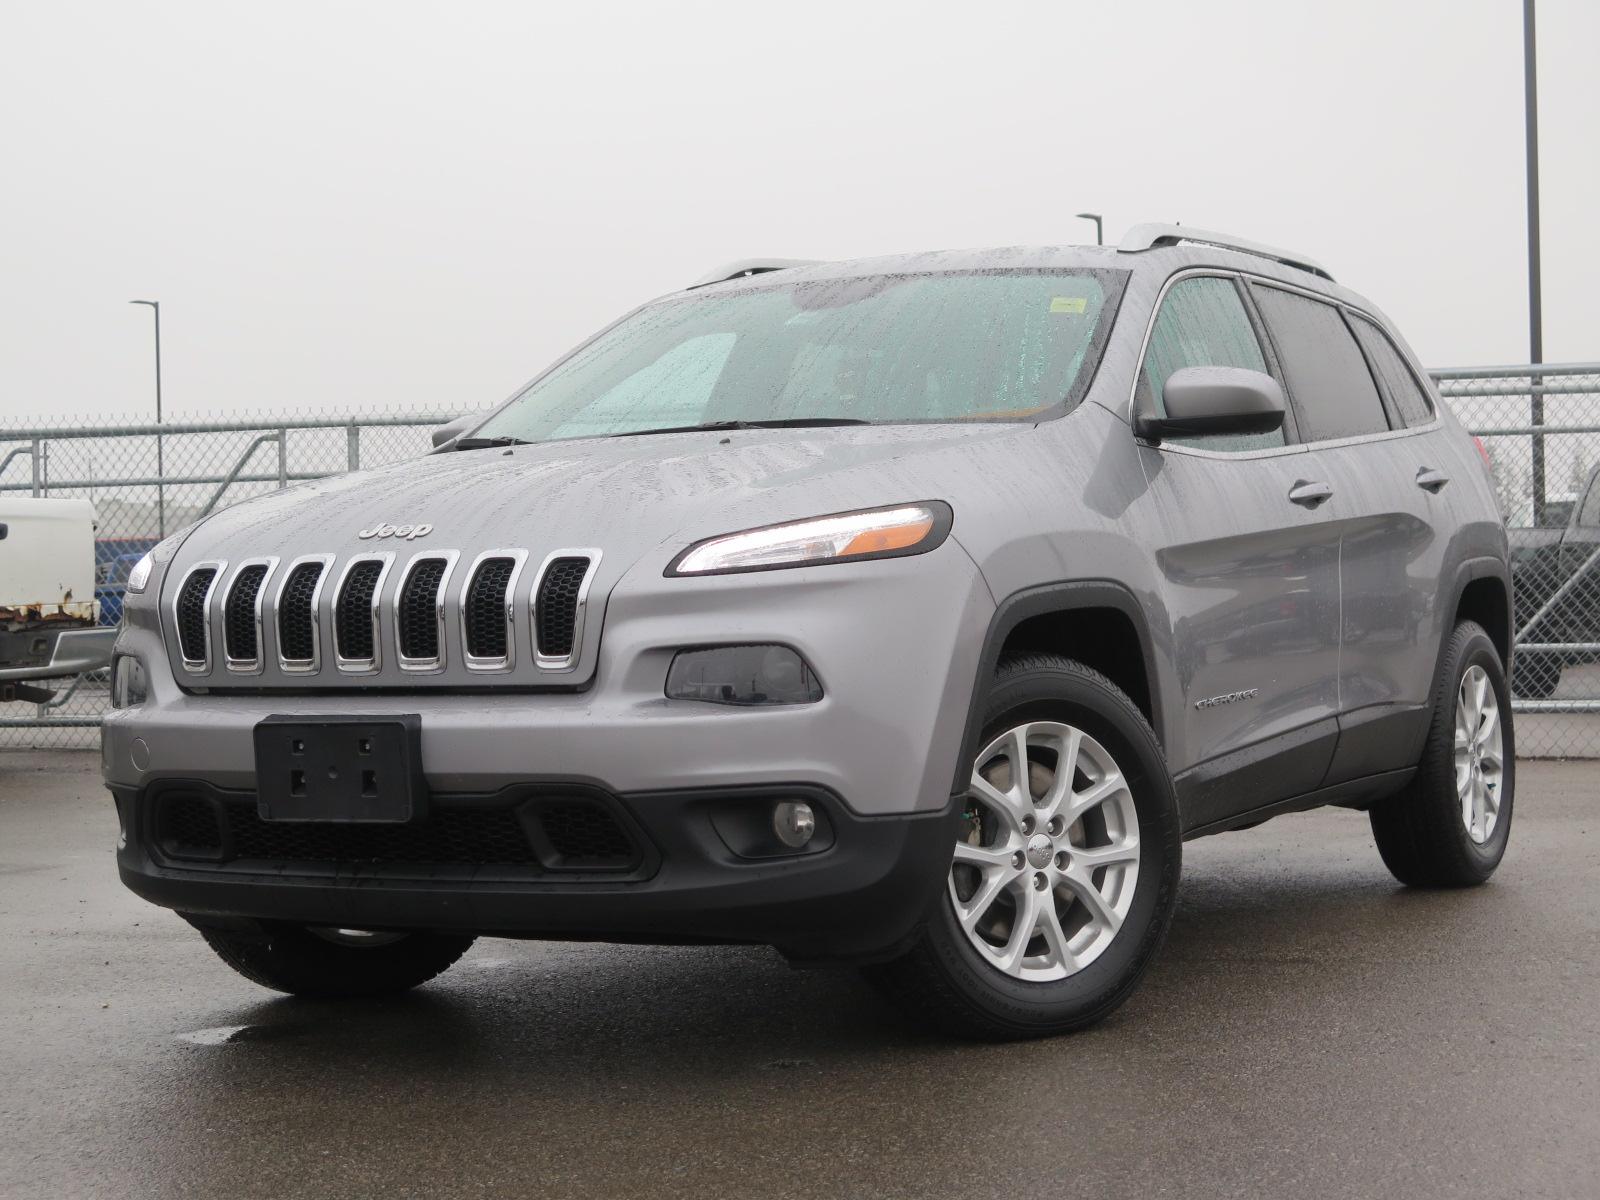 New 2015 Jeep Cherokee, $23177